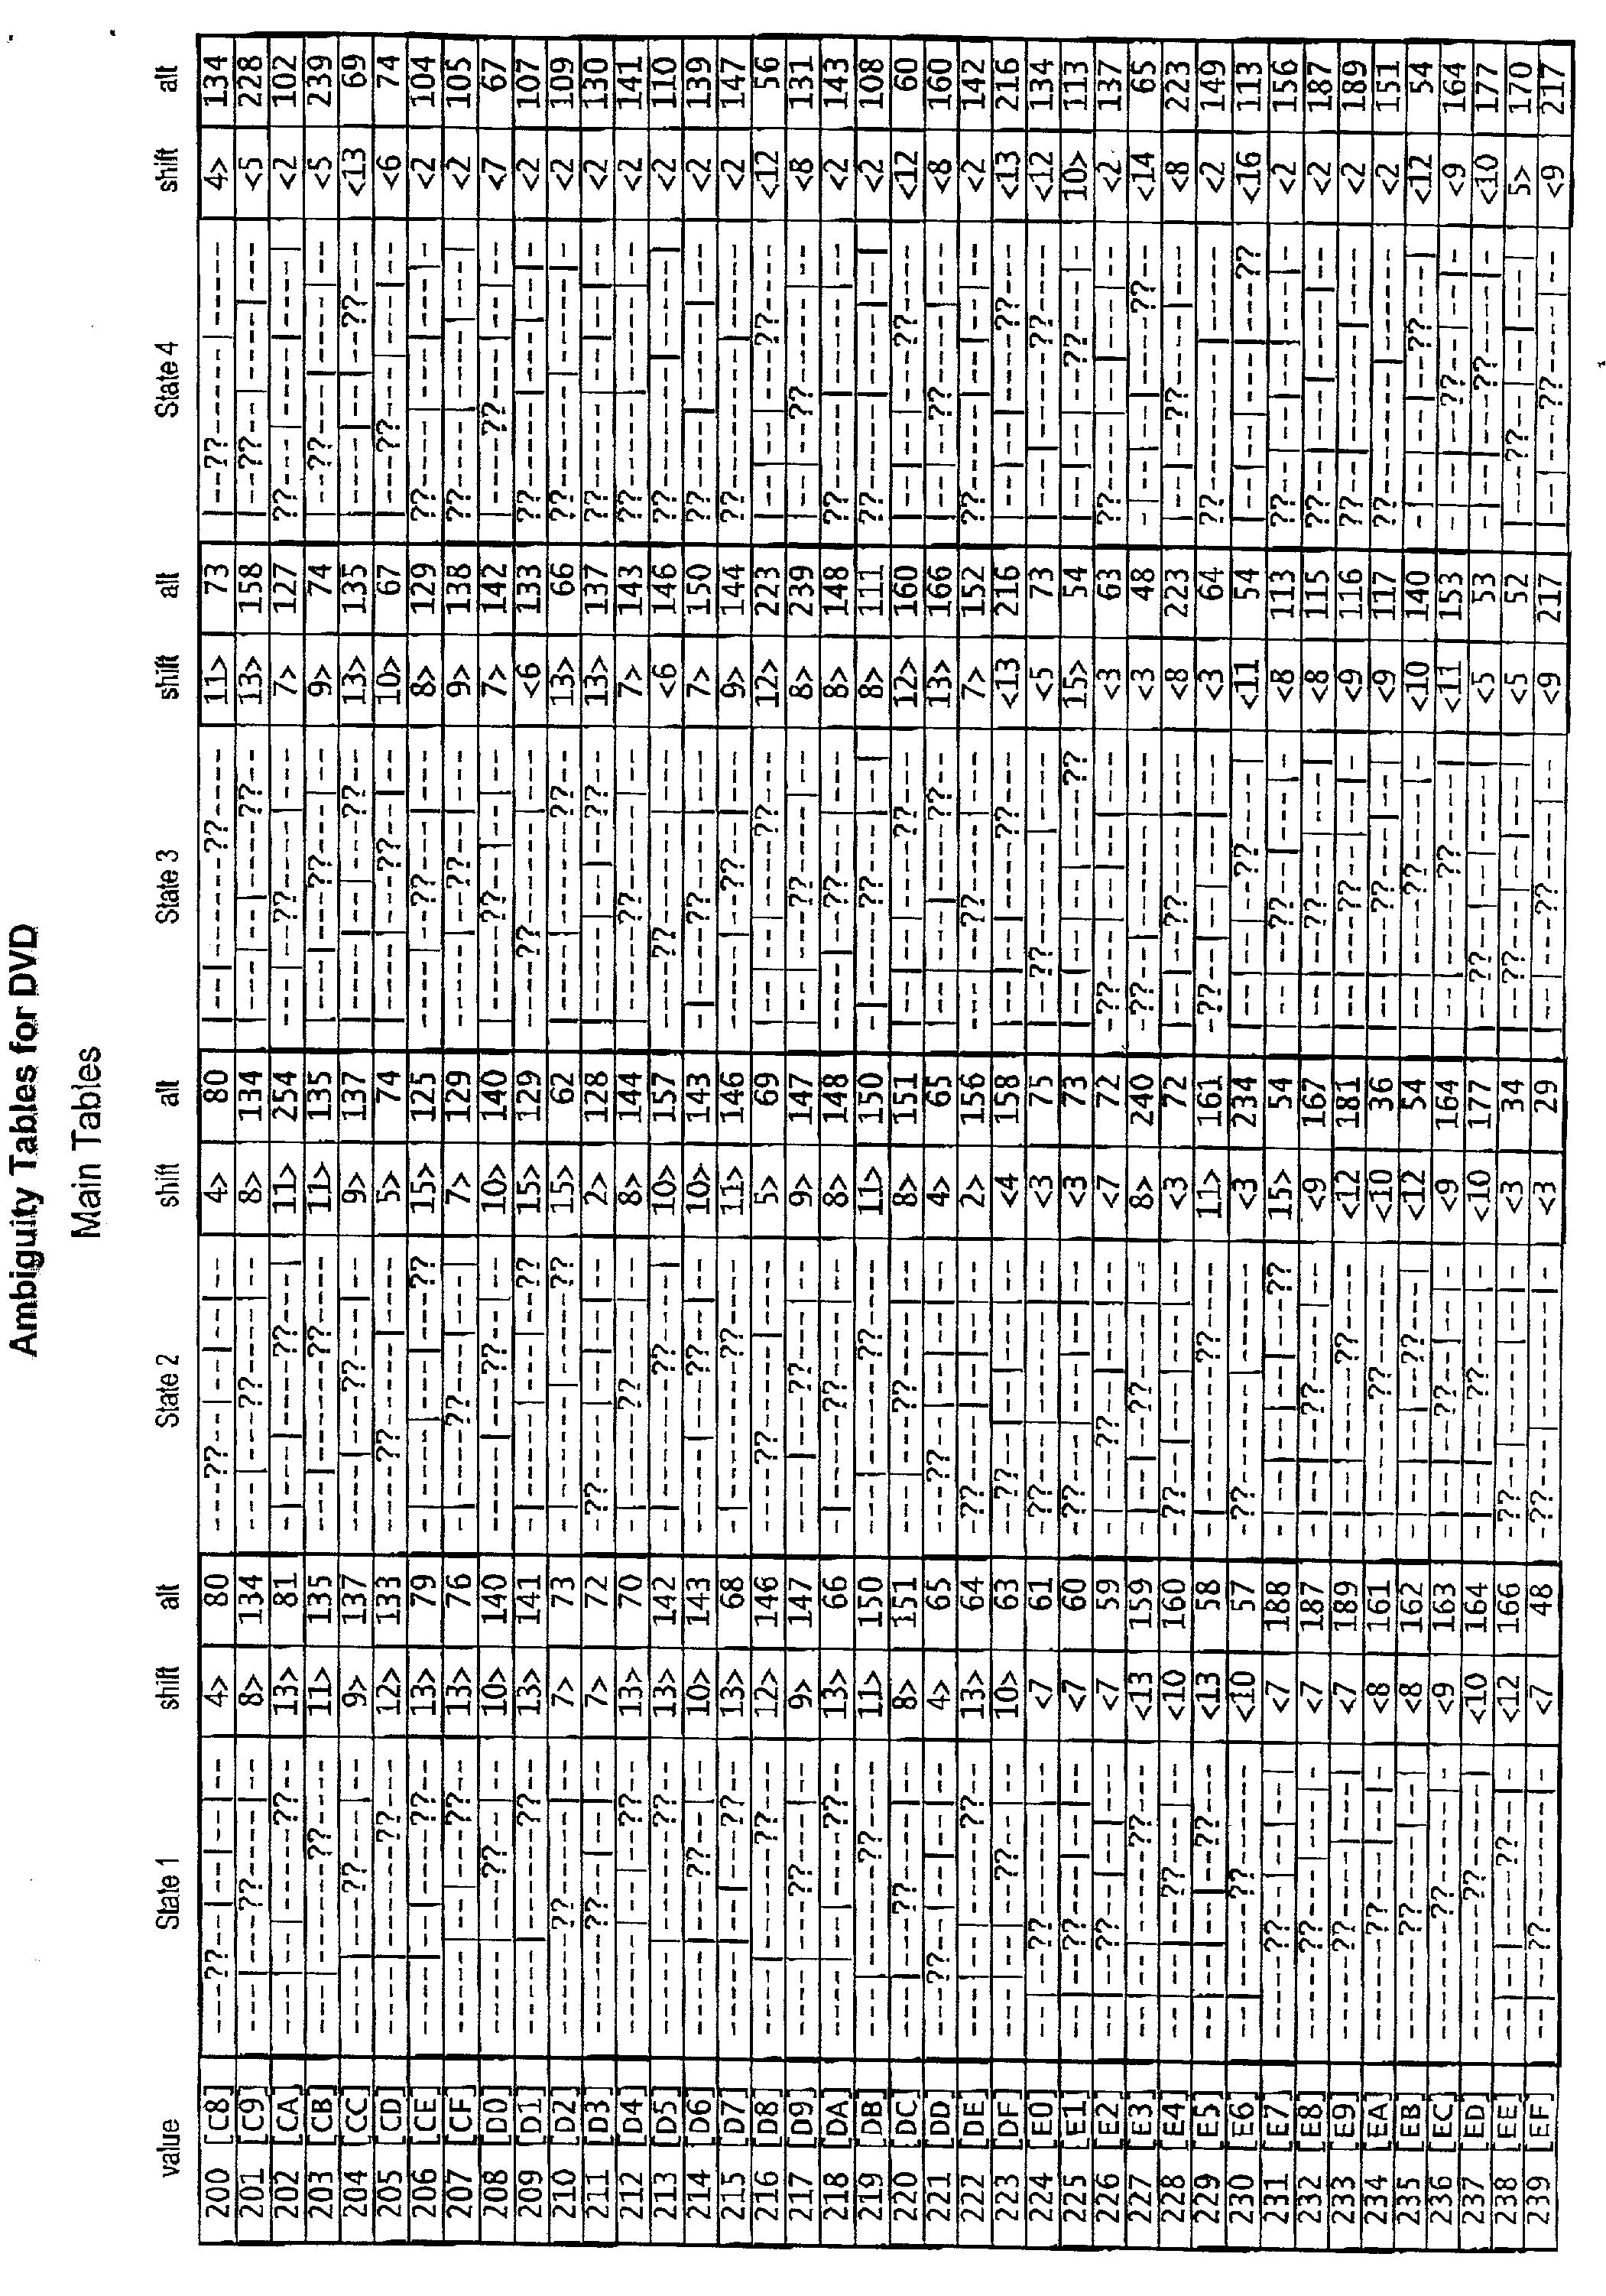 Figure US20020069389A1-20020606-P00007